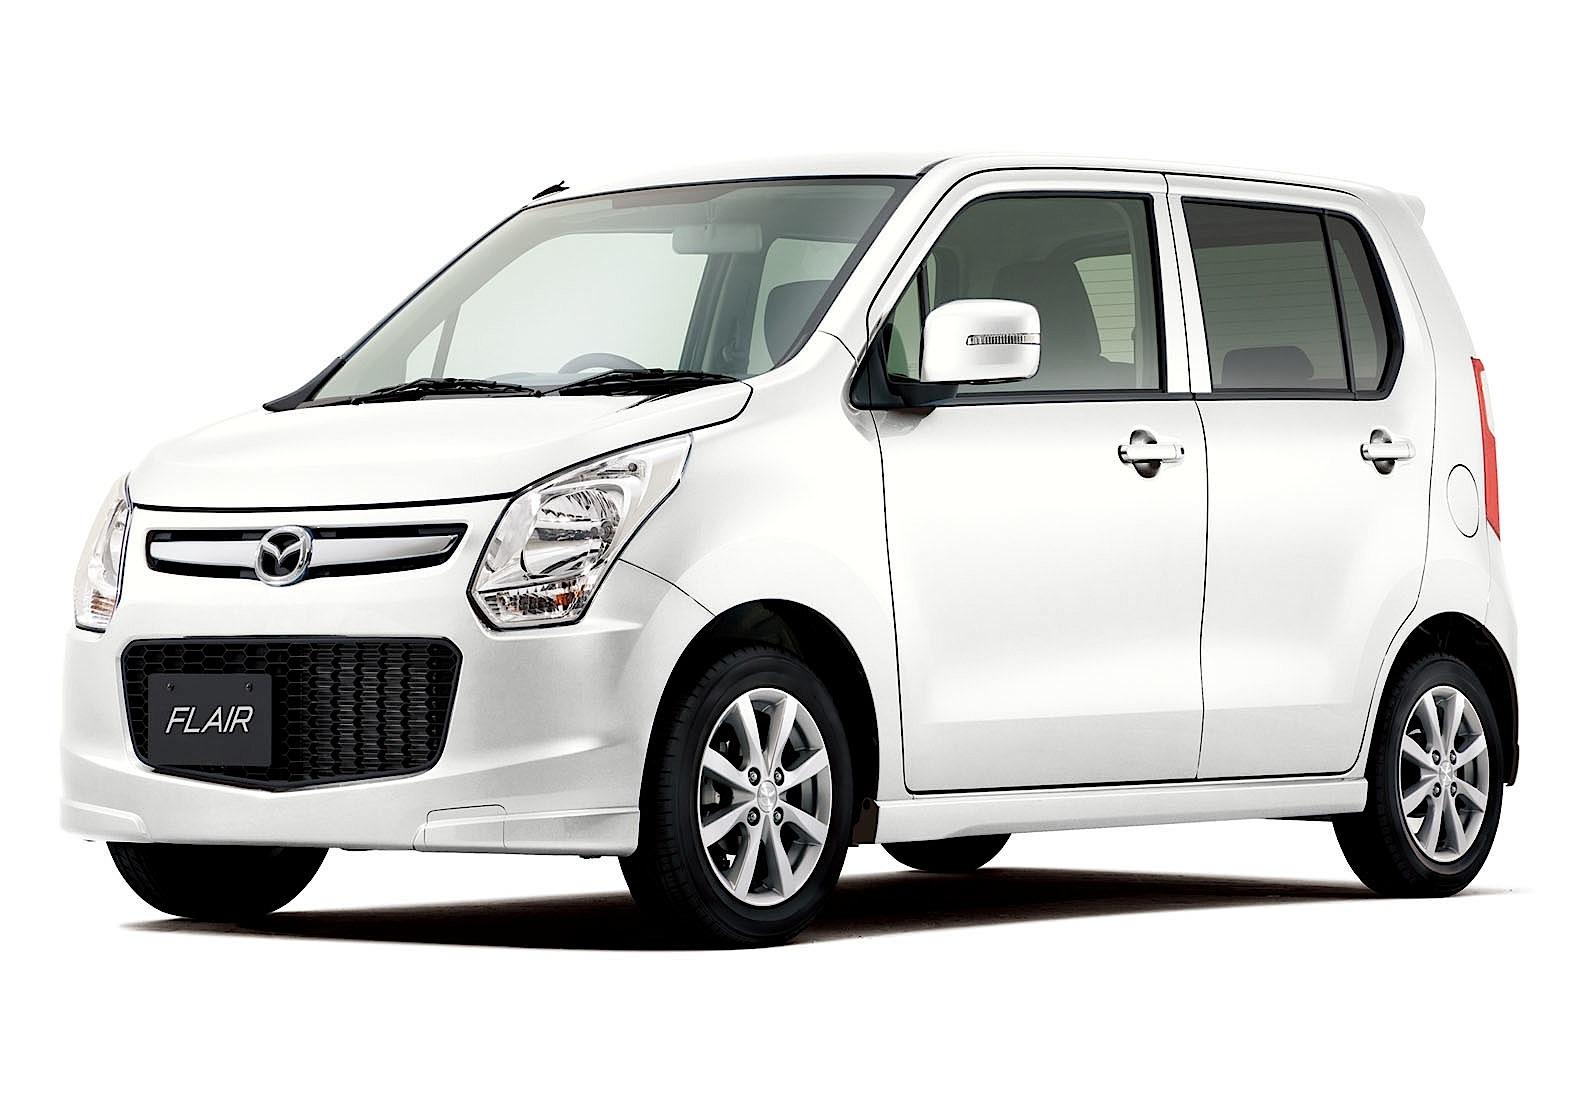 Mazda Flair I 2012 - 2014 Microvan #4